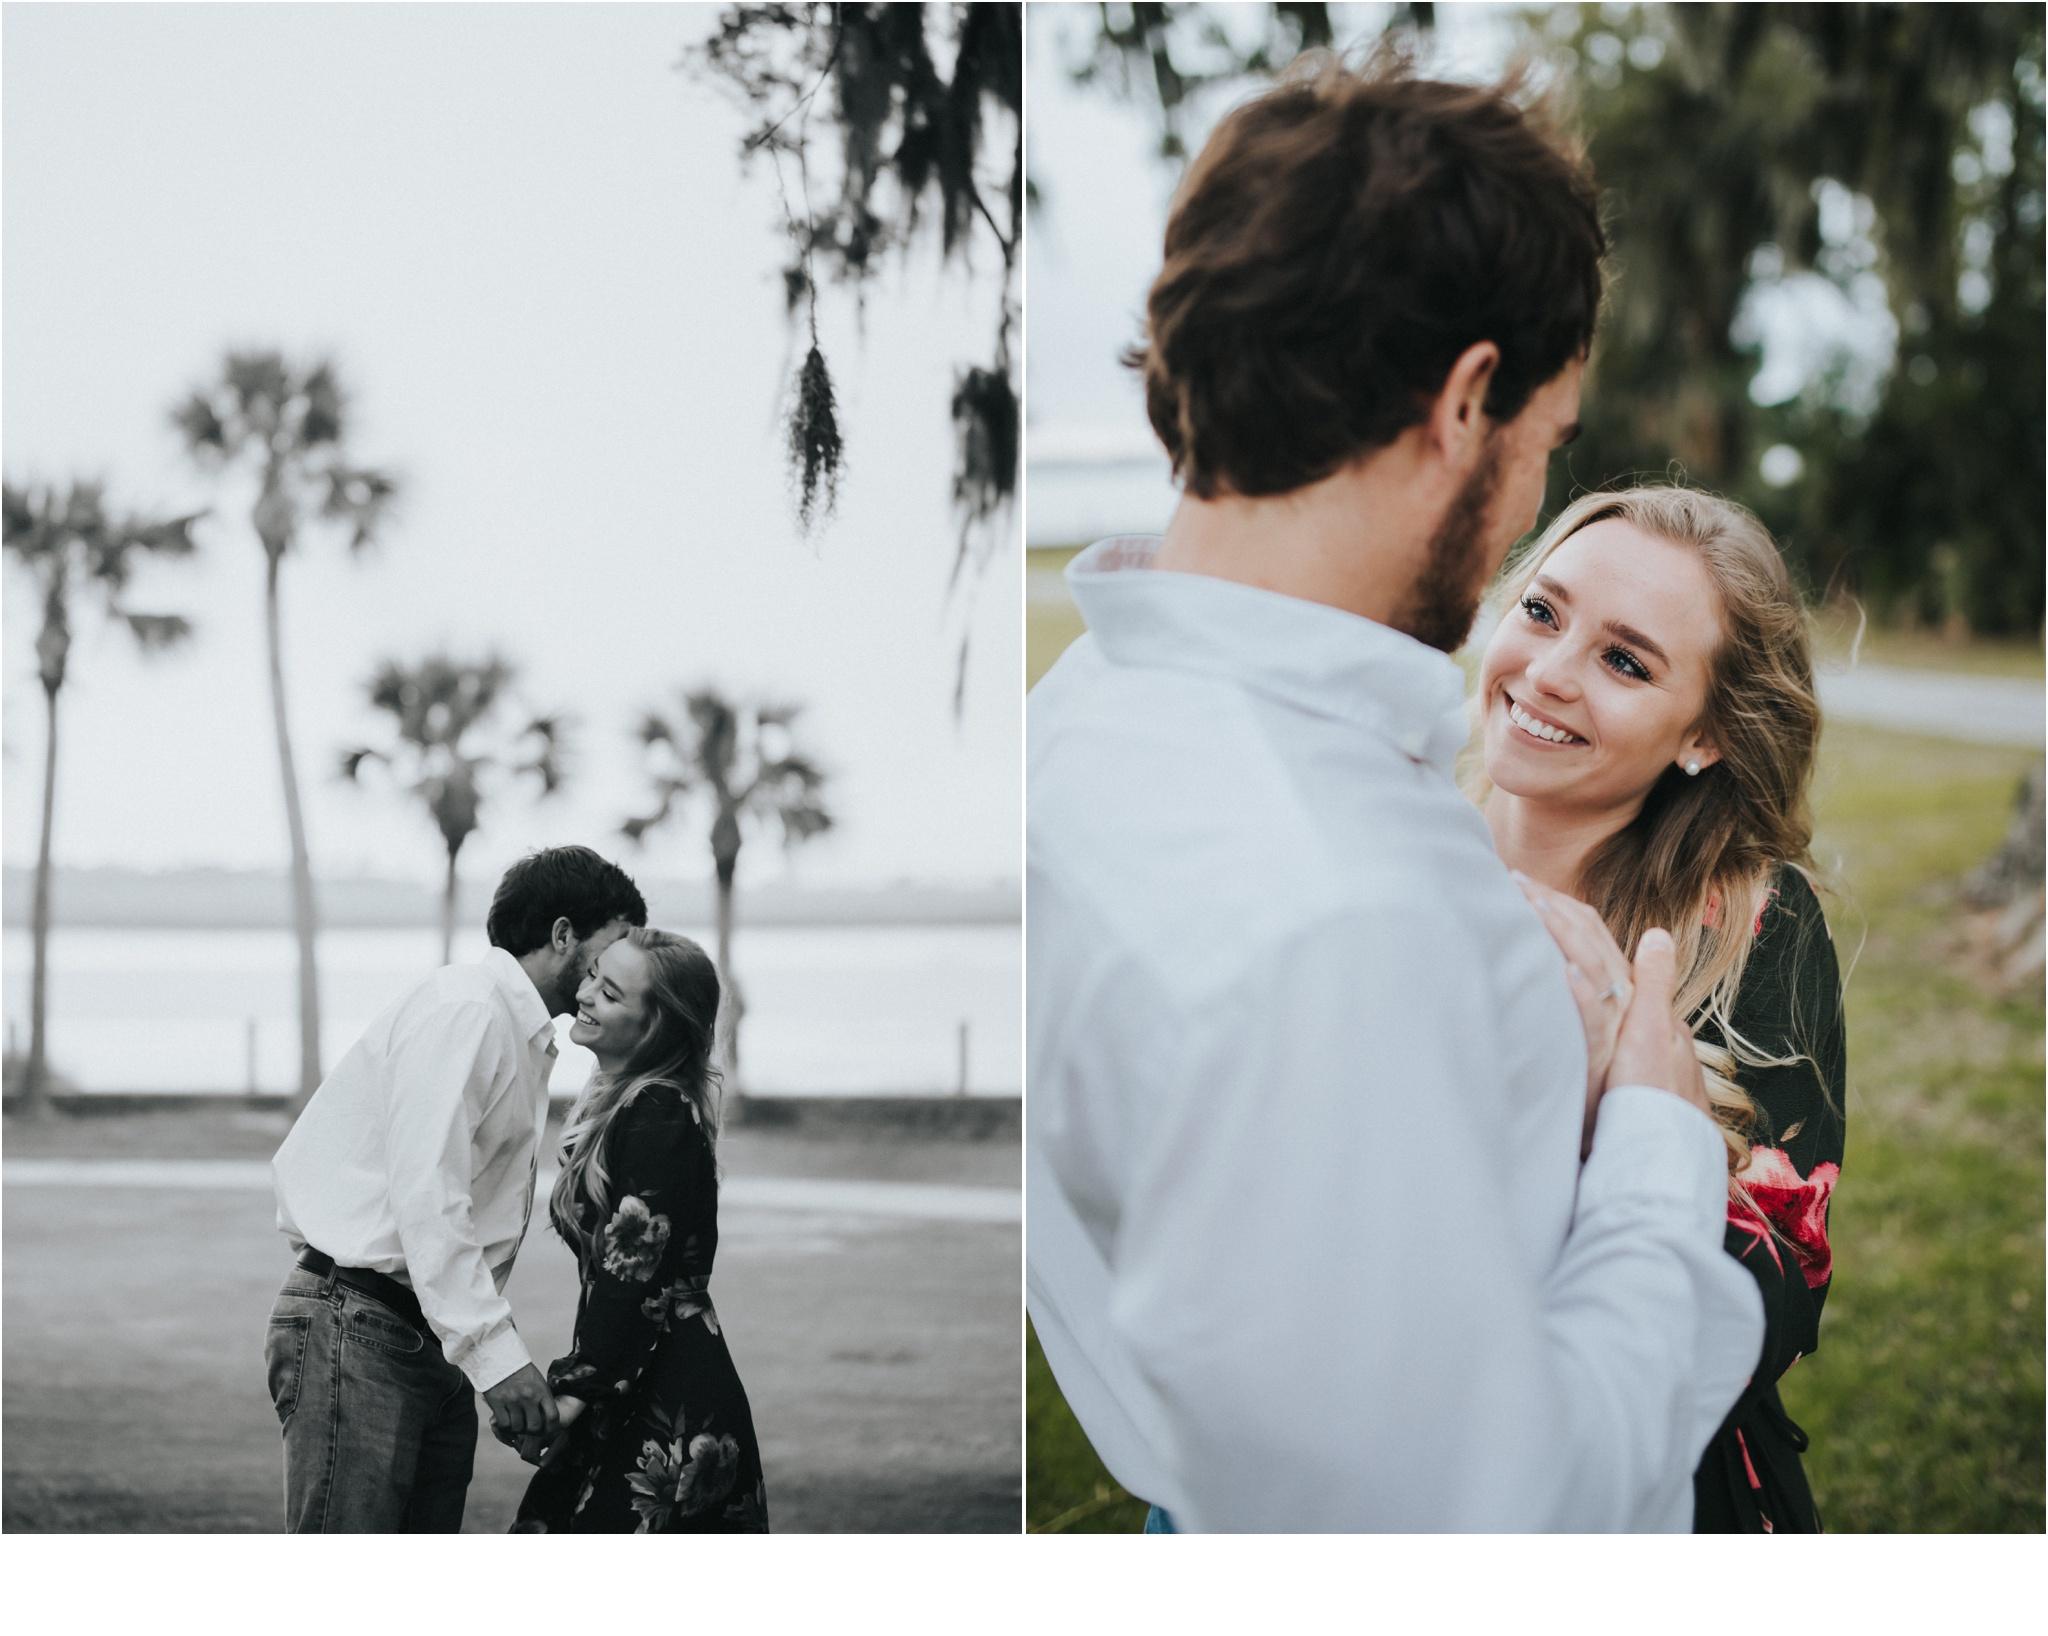 Rainey_Gregg_Photography_St._Simons_Island_Georgia_California_Wedding_Portrait_Photography_0715.jpg